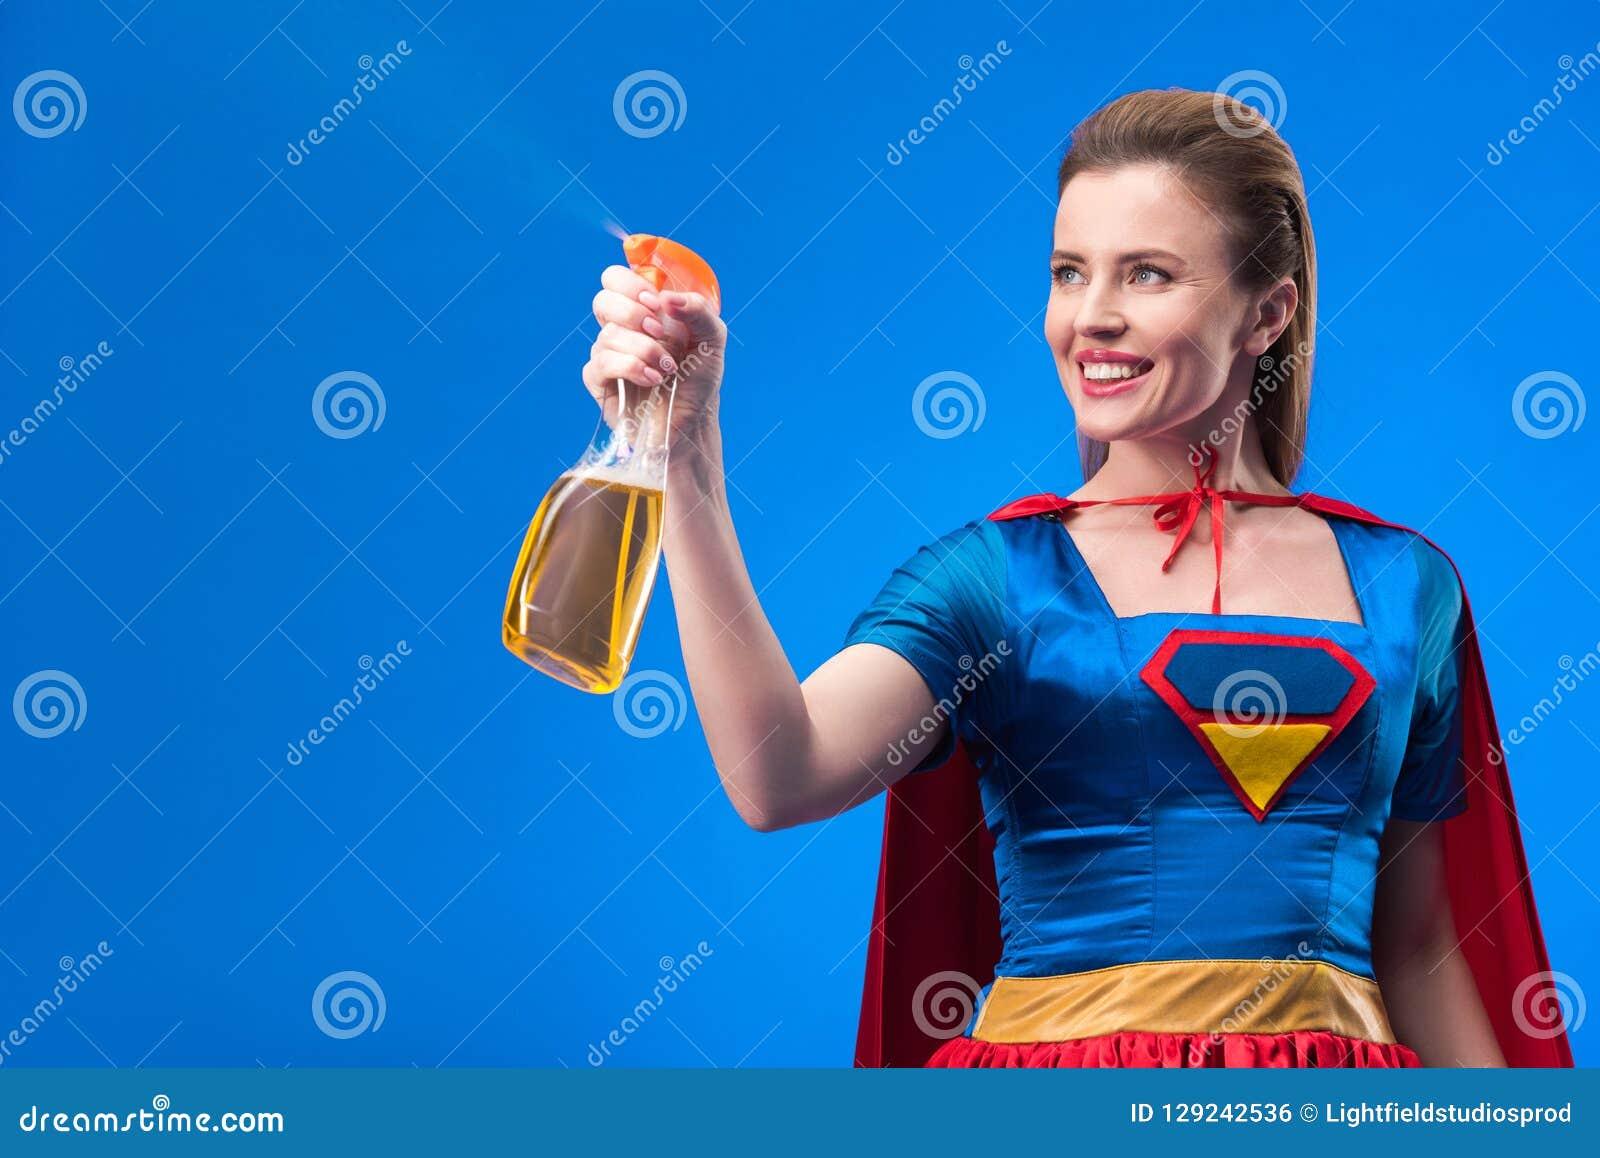 portrait of cheerful superwoman with detergent in hand